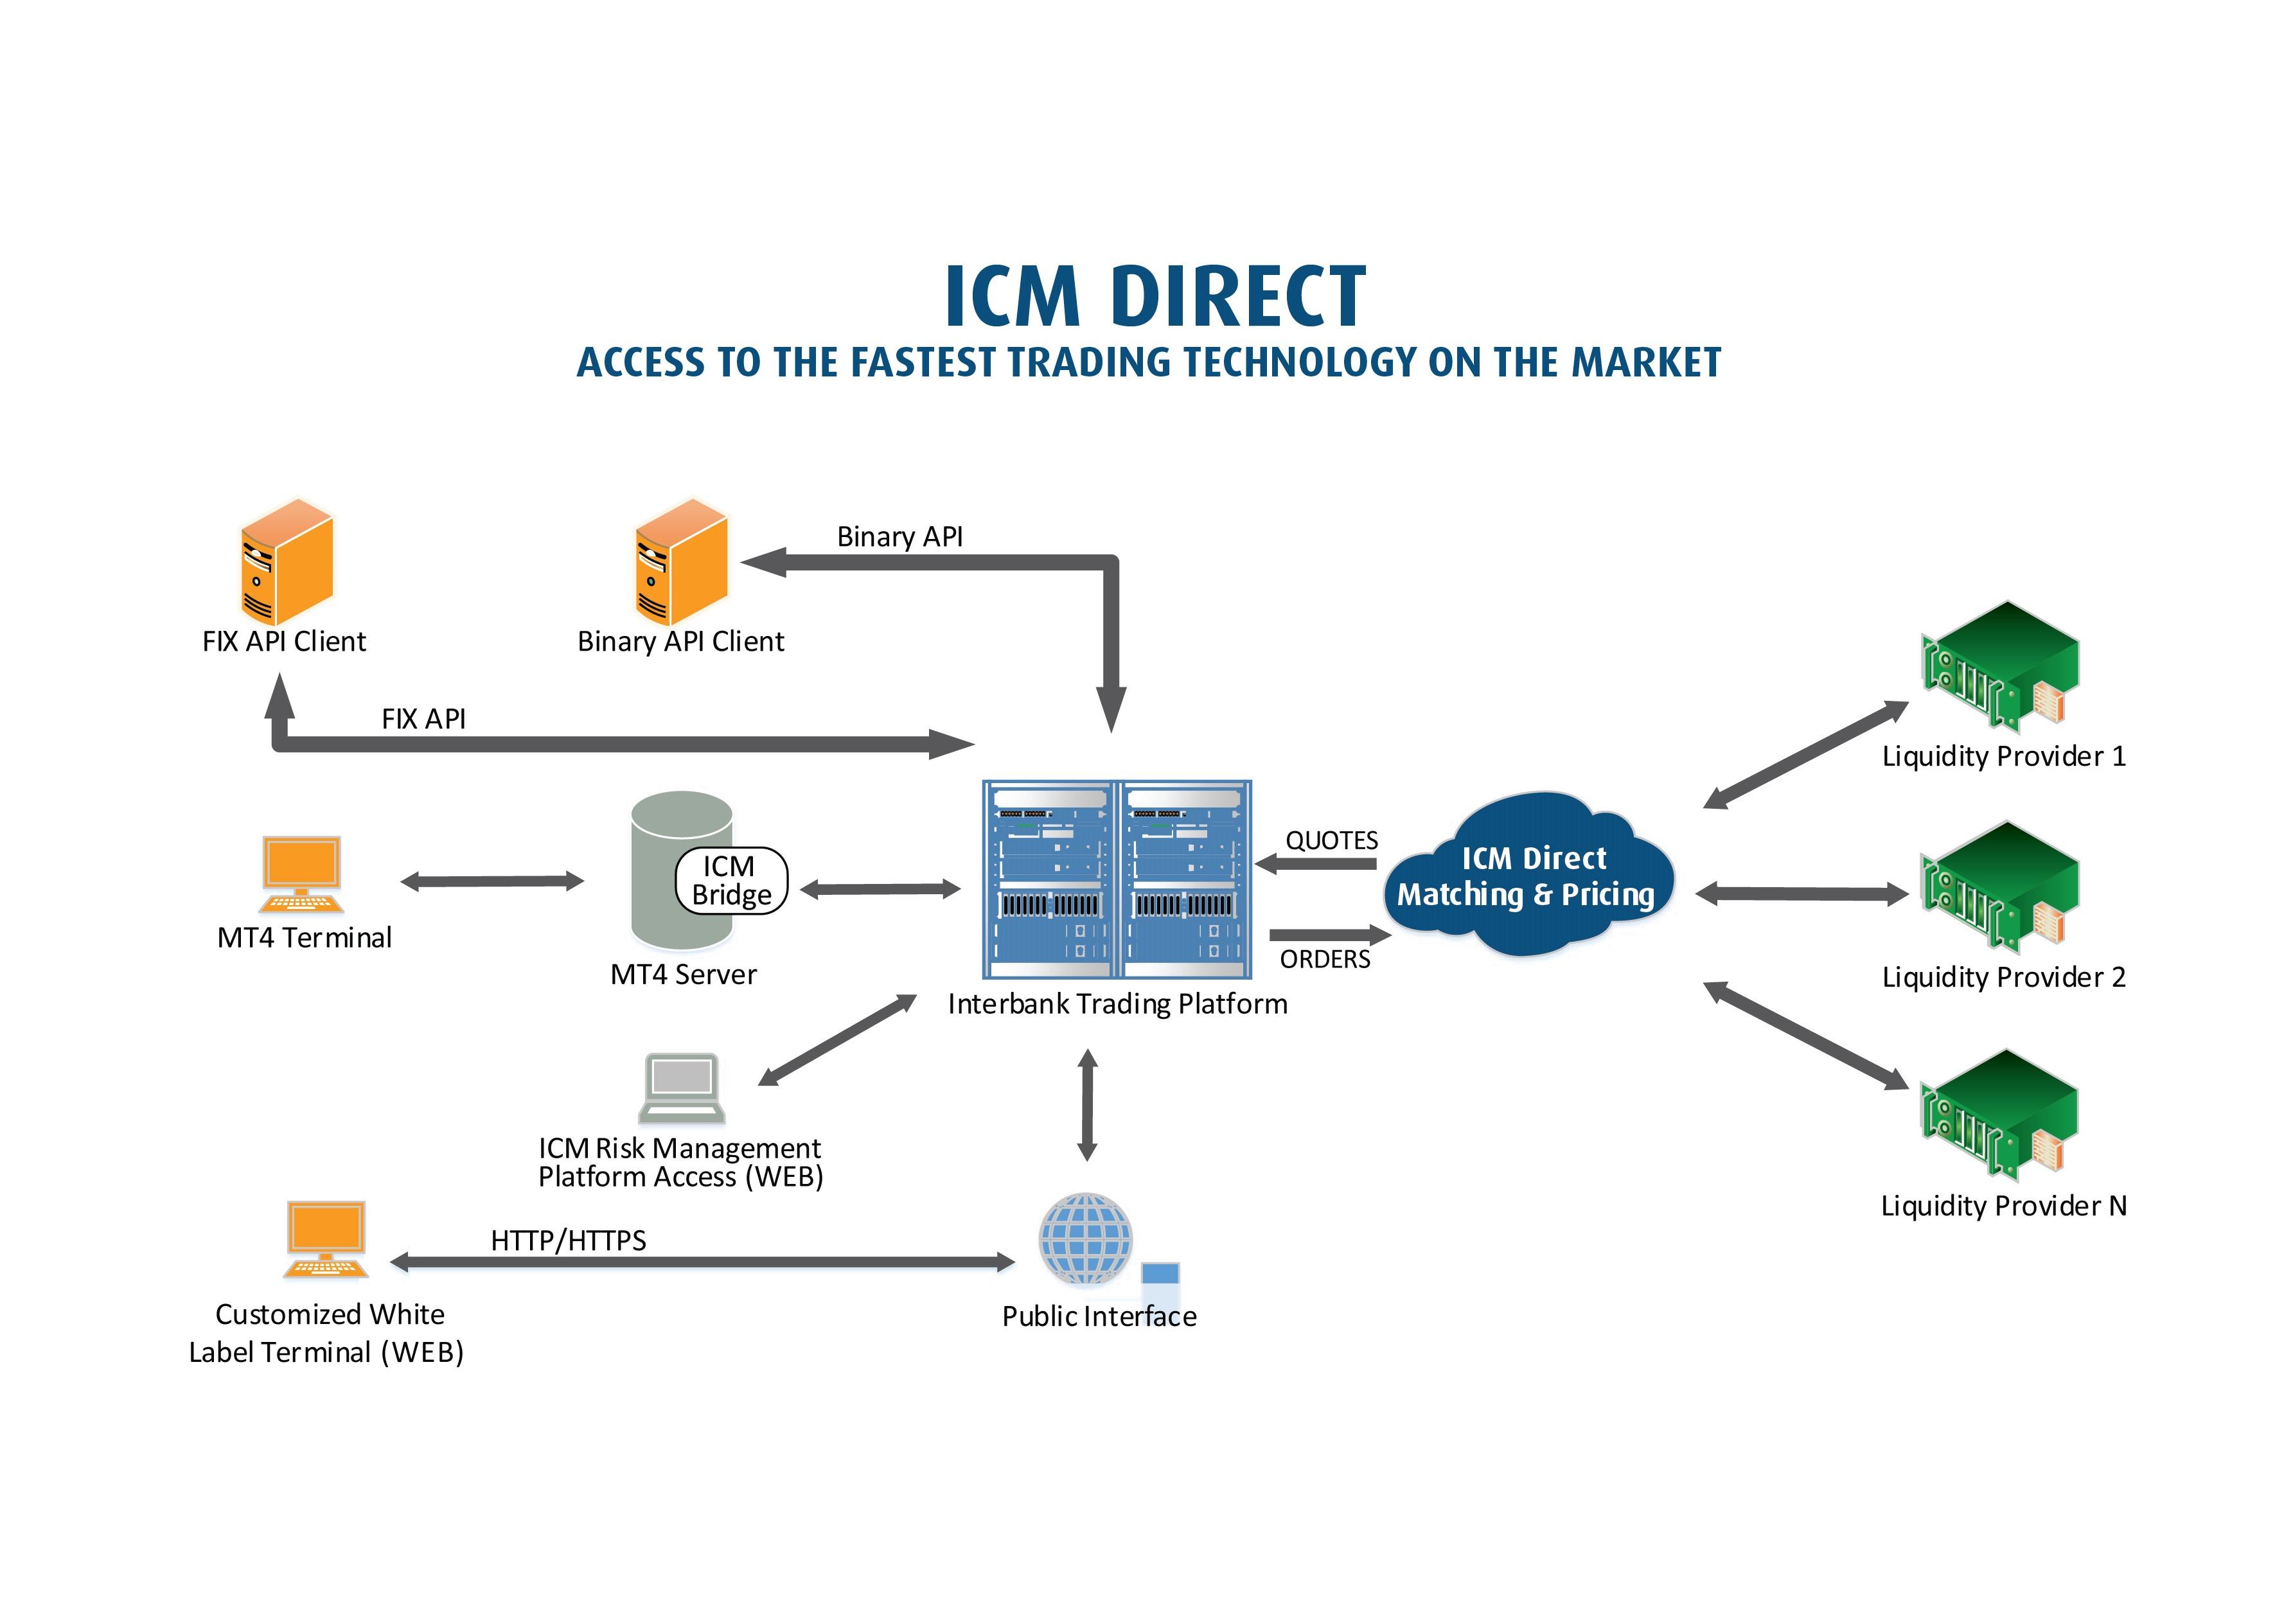 ICM Direct